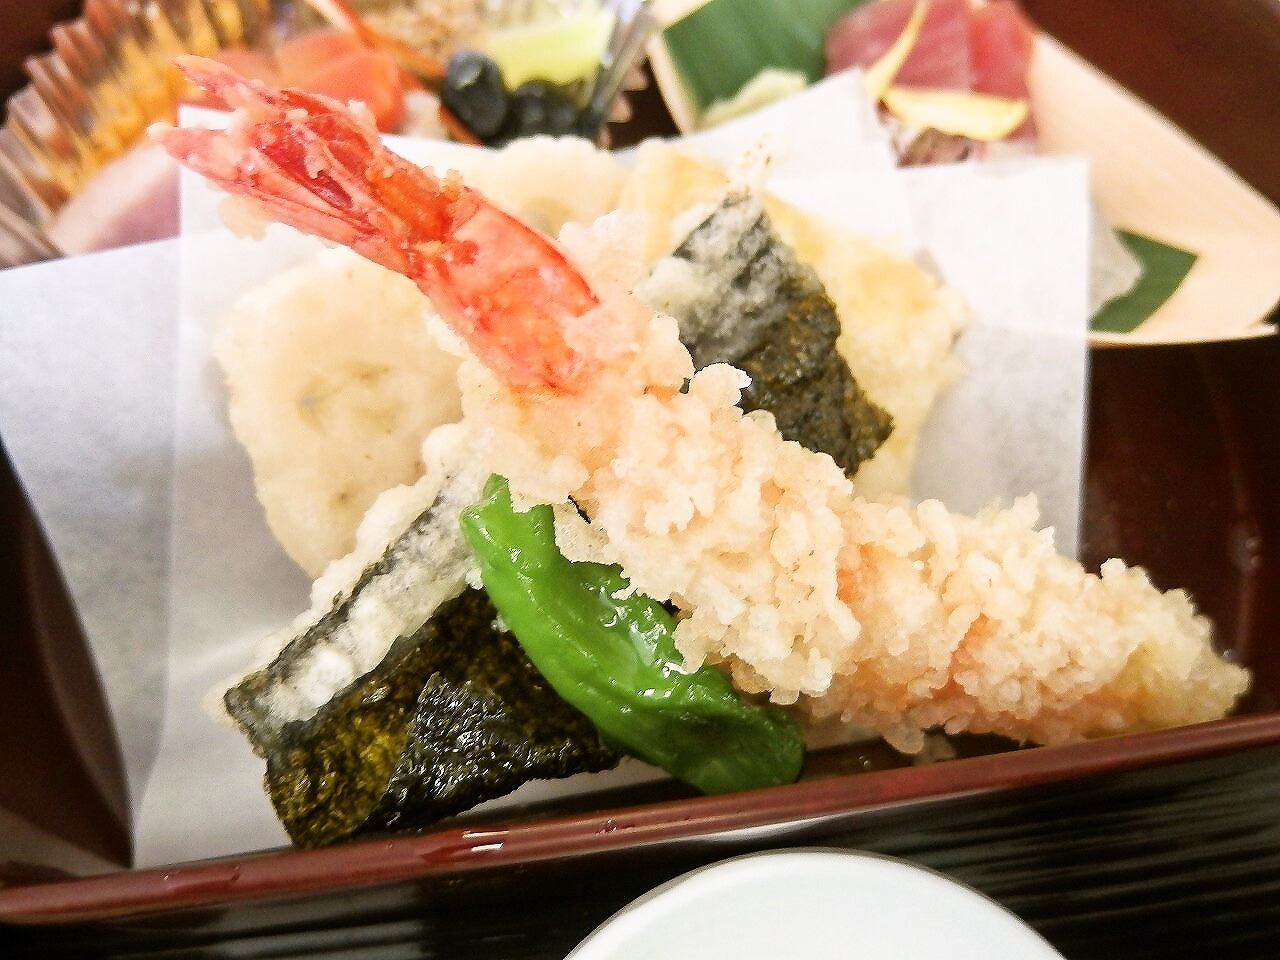 s-foodpic7439499.jpg